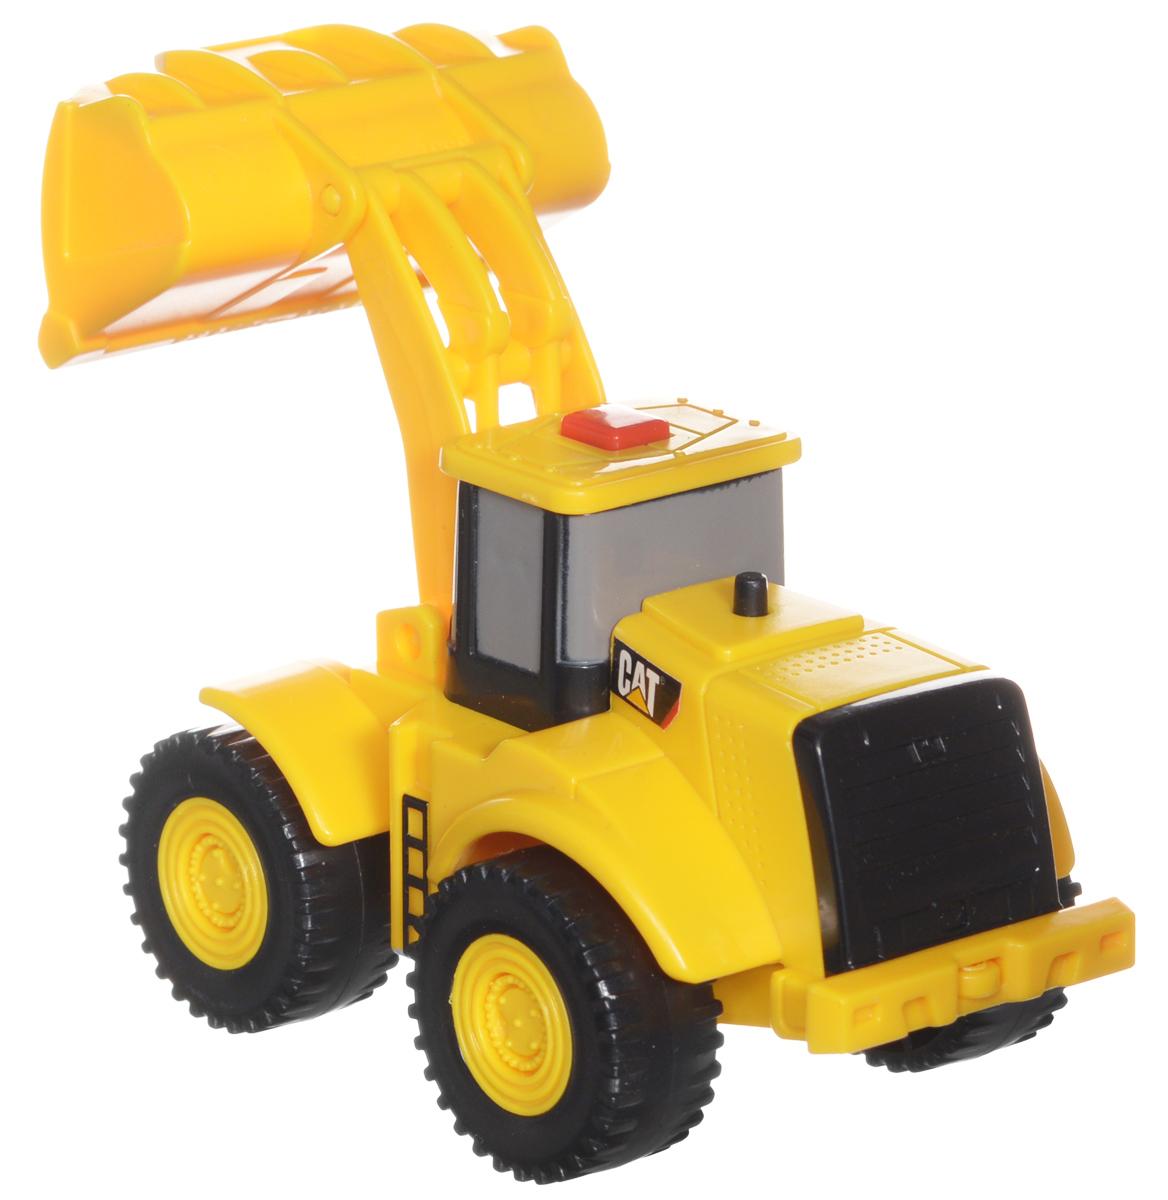 Toystate Погрузчик Flash Rides Cat toystate машина со светом и звуком toystate в ассортименте